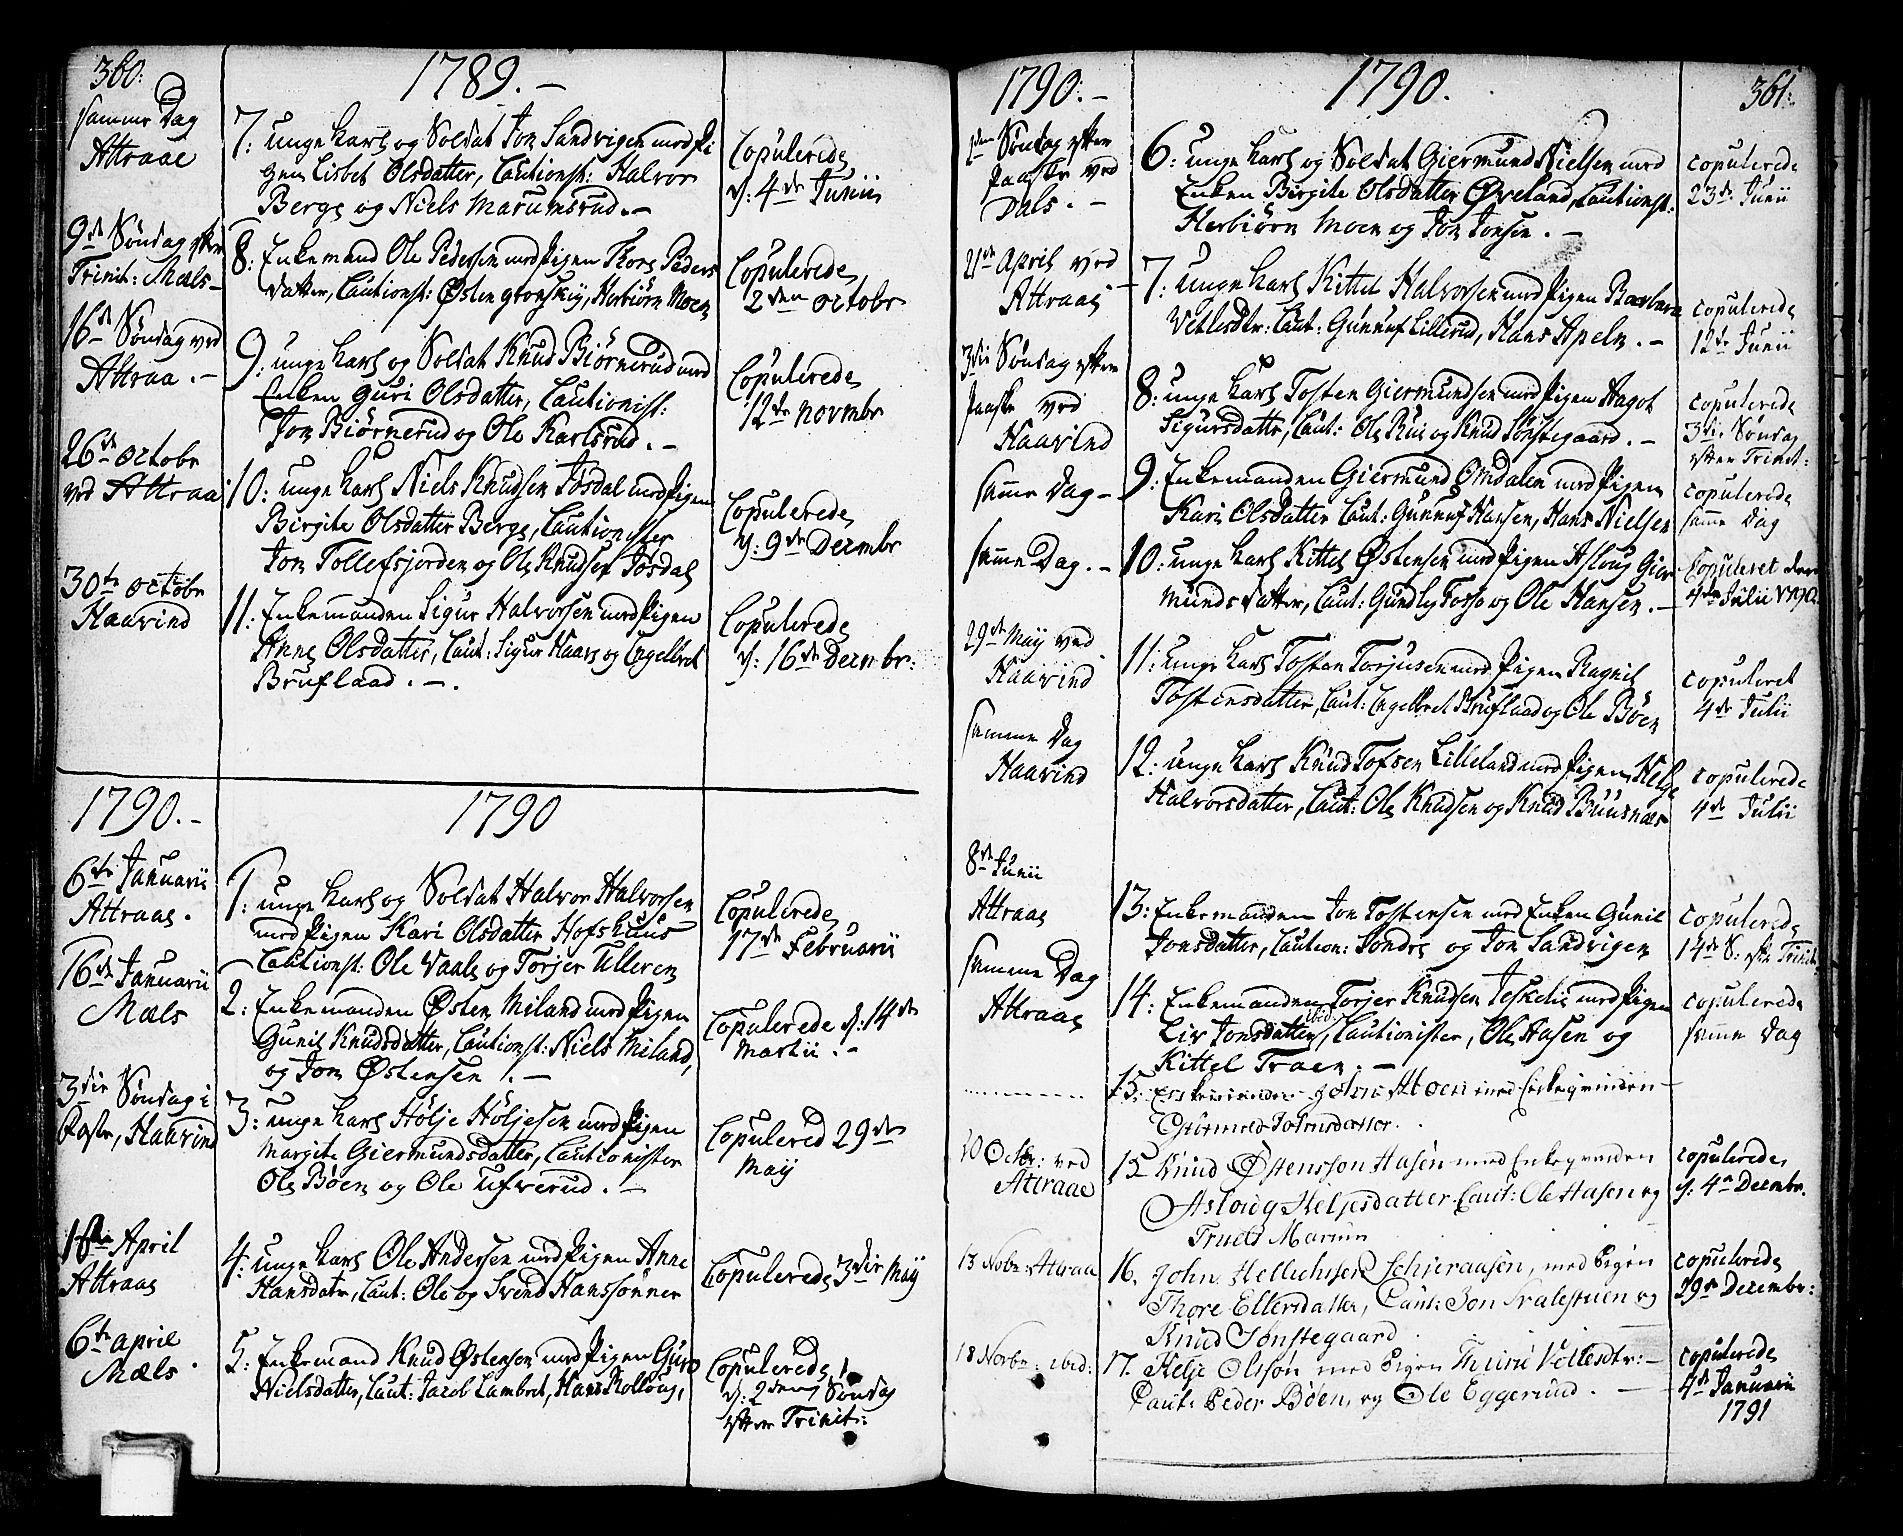 SAKO, Tinn kirkebøker, F/Fa/L0002: Ministerialbok nr. I 2, 1757-1810, s. 360-361